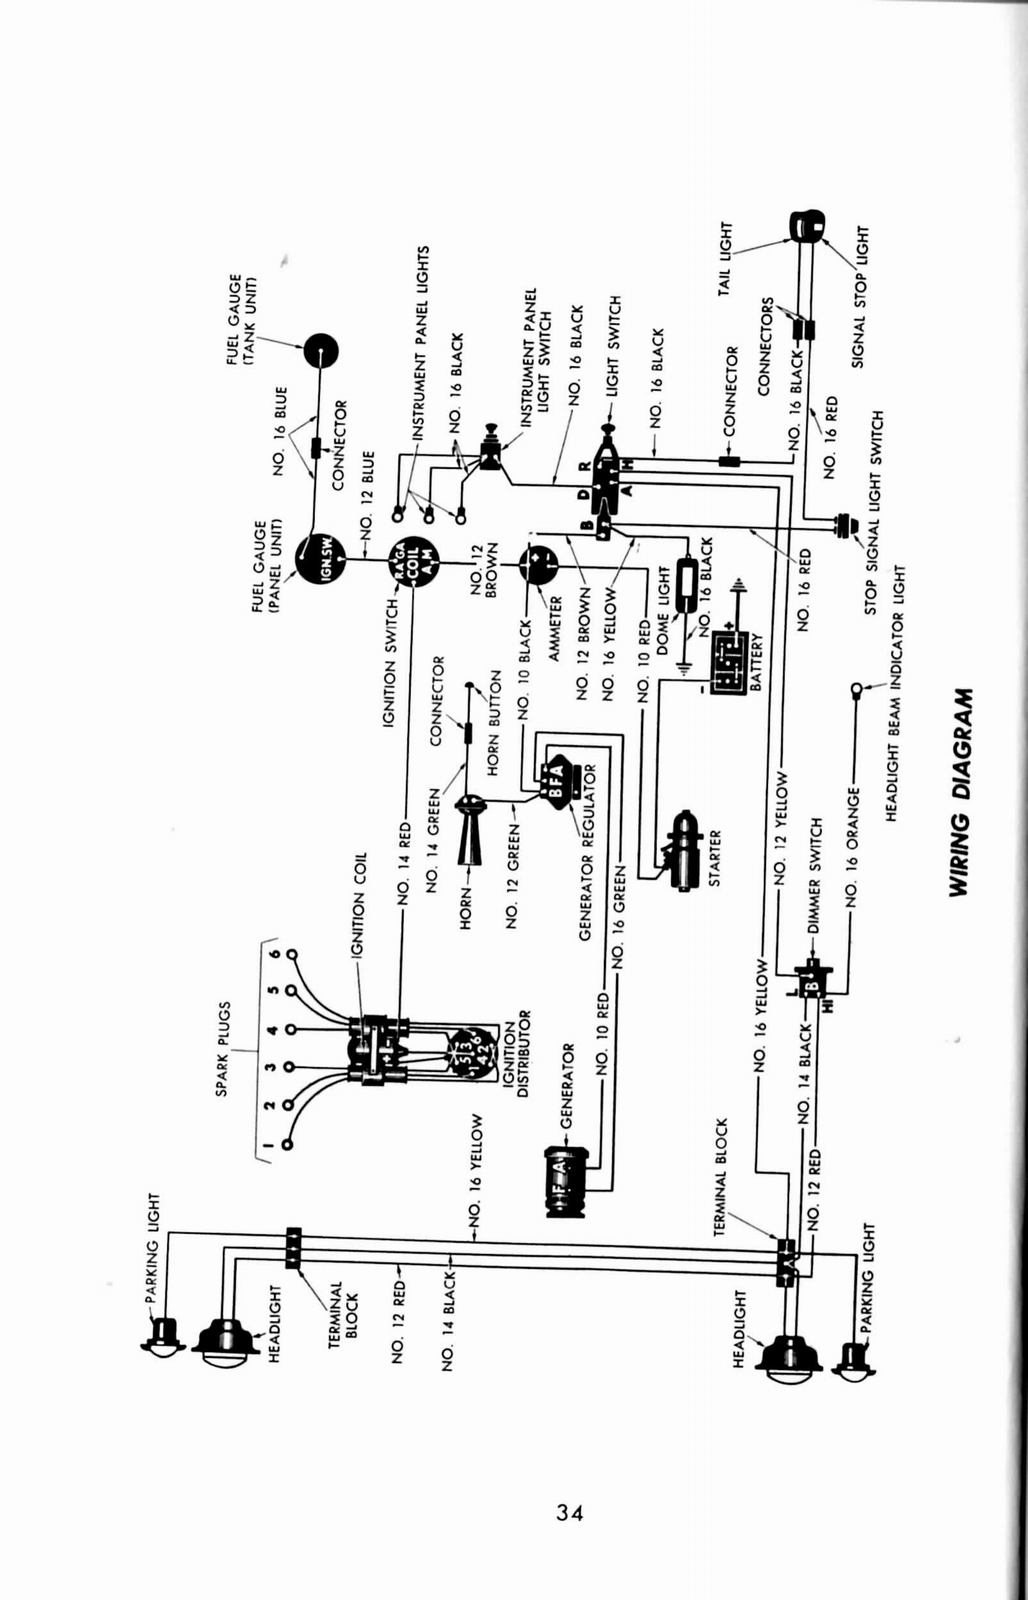 1949 Dodge Truck Operators Manual